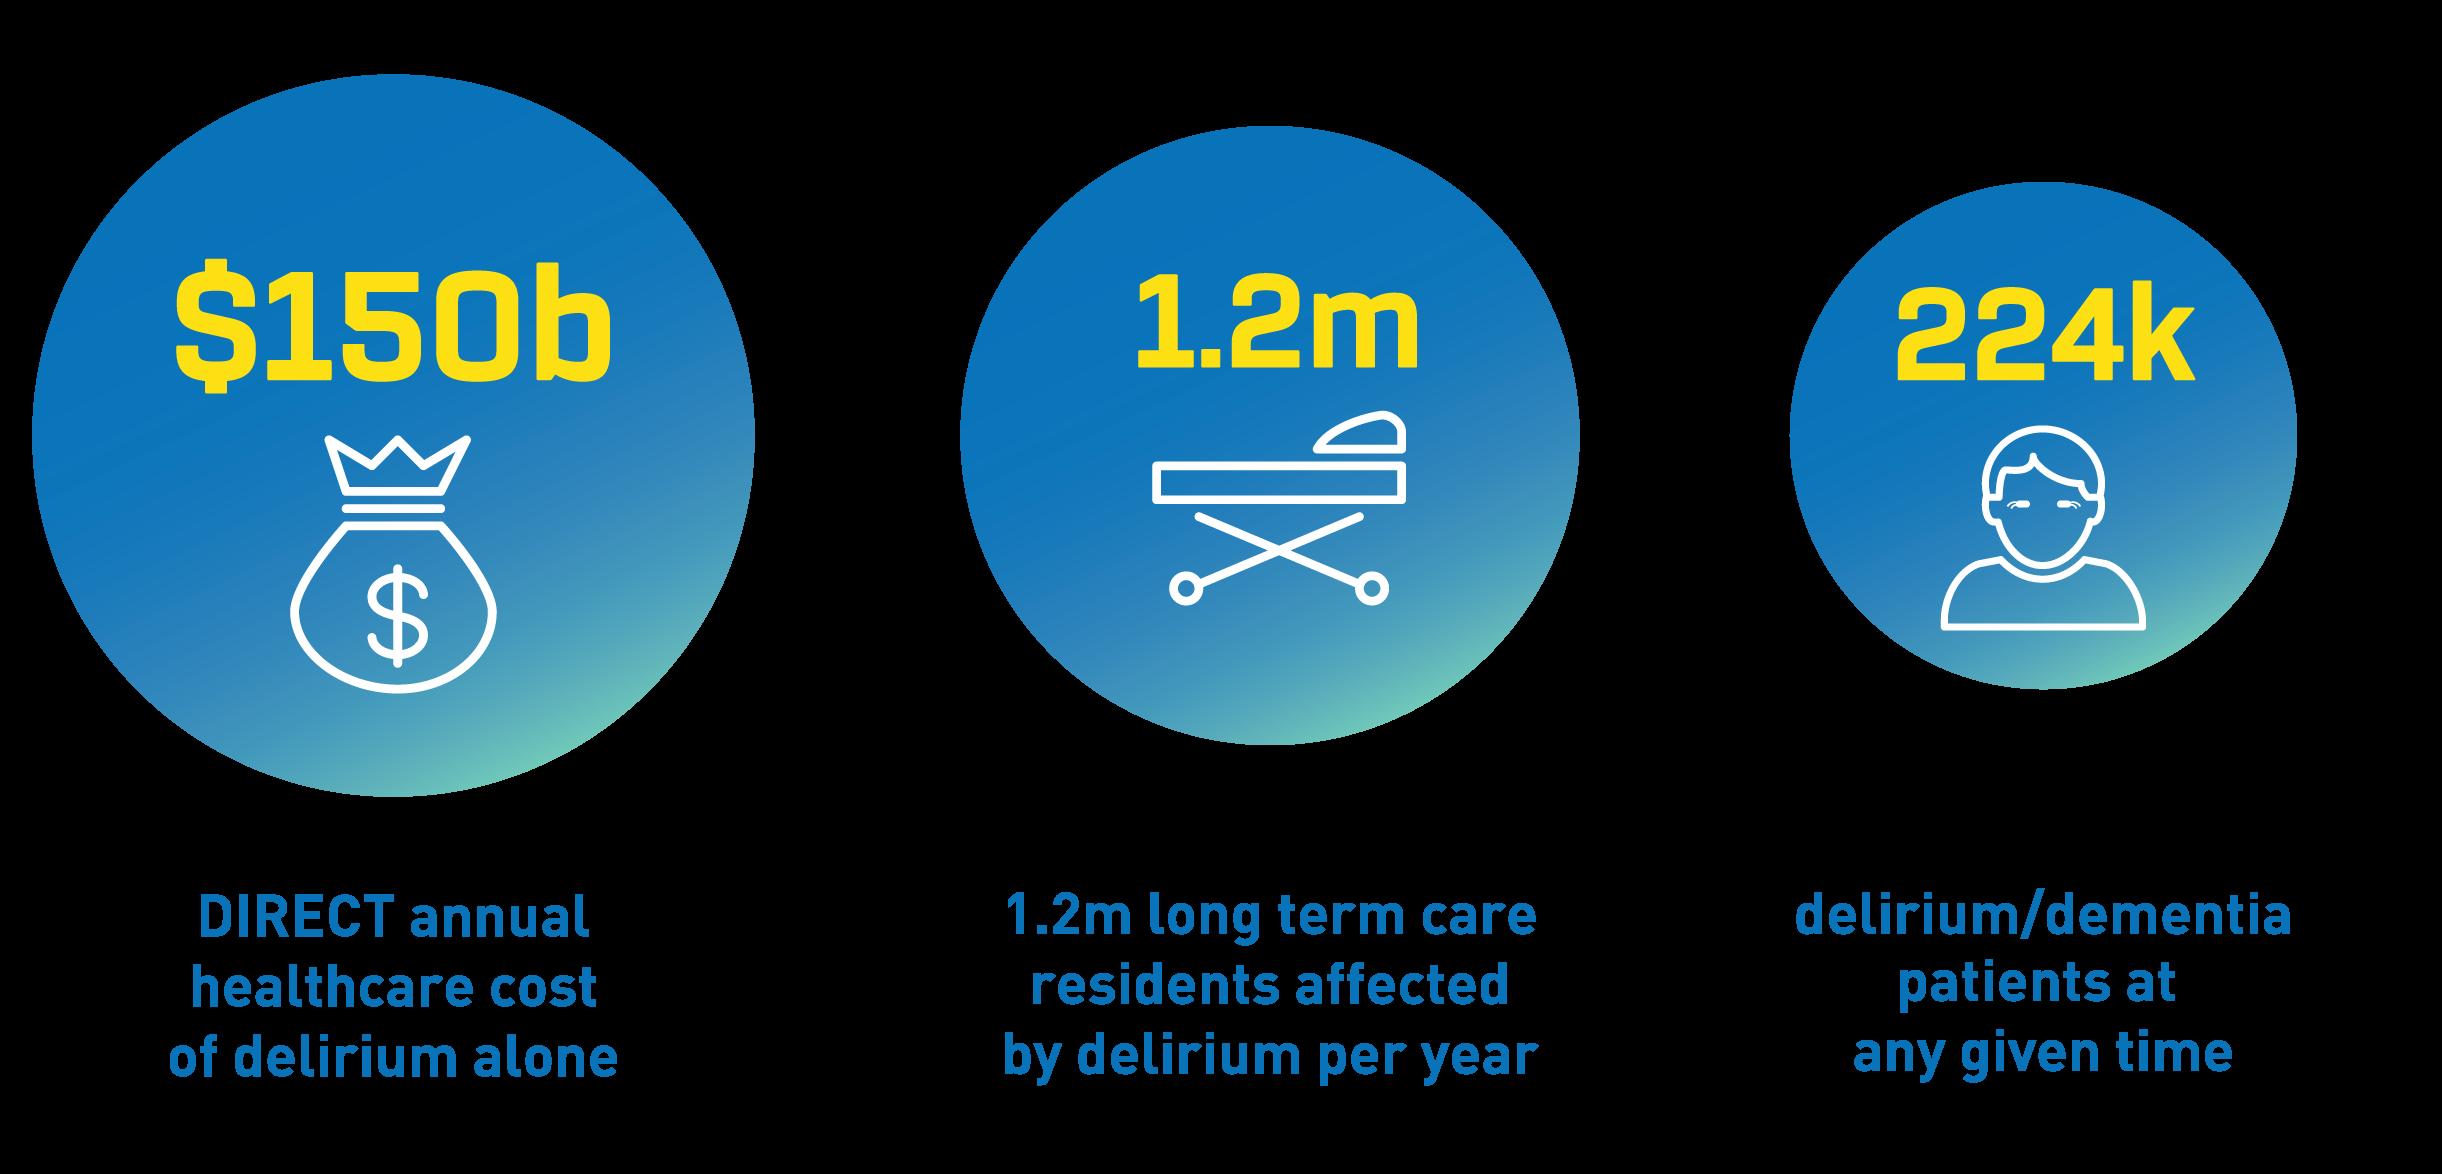 Hospital Bed Cost Per Day Australia